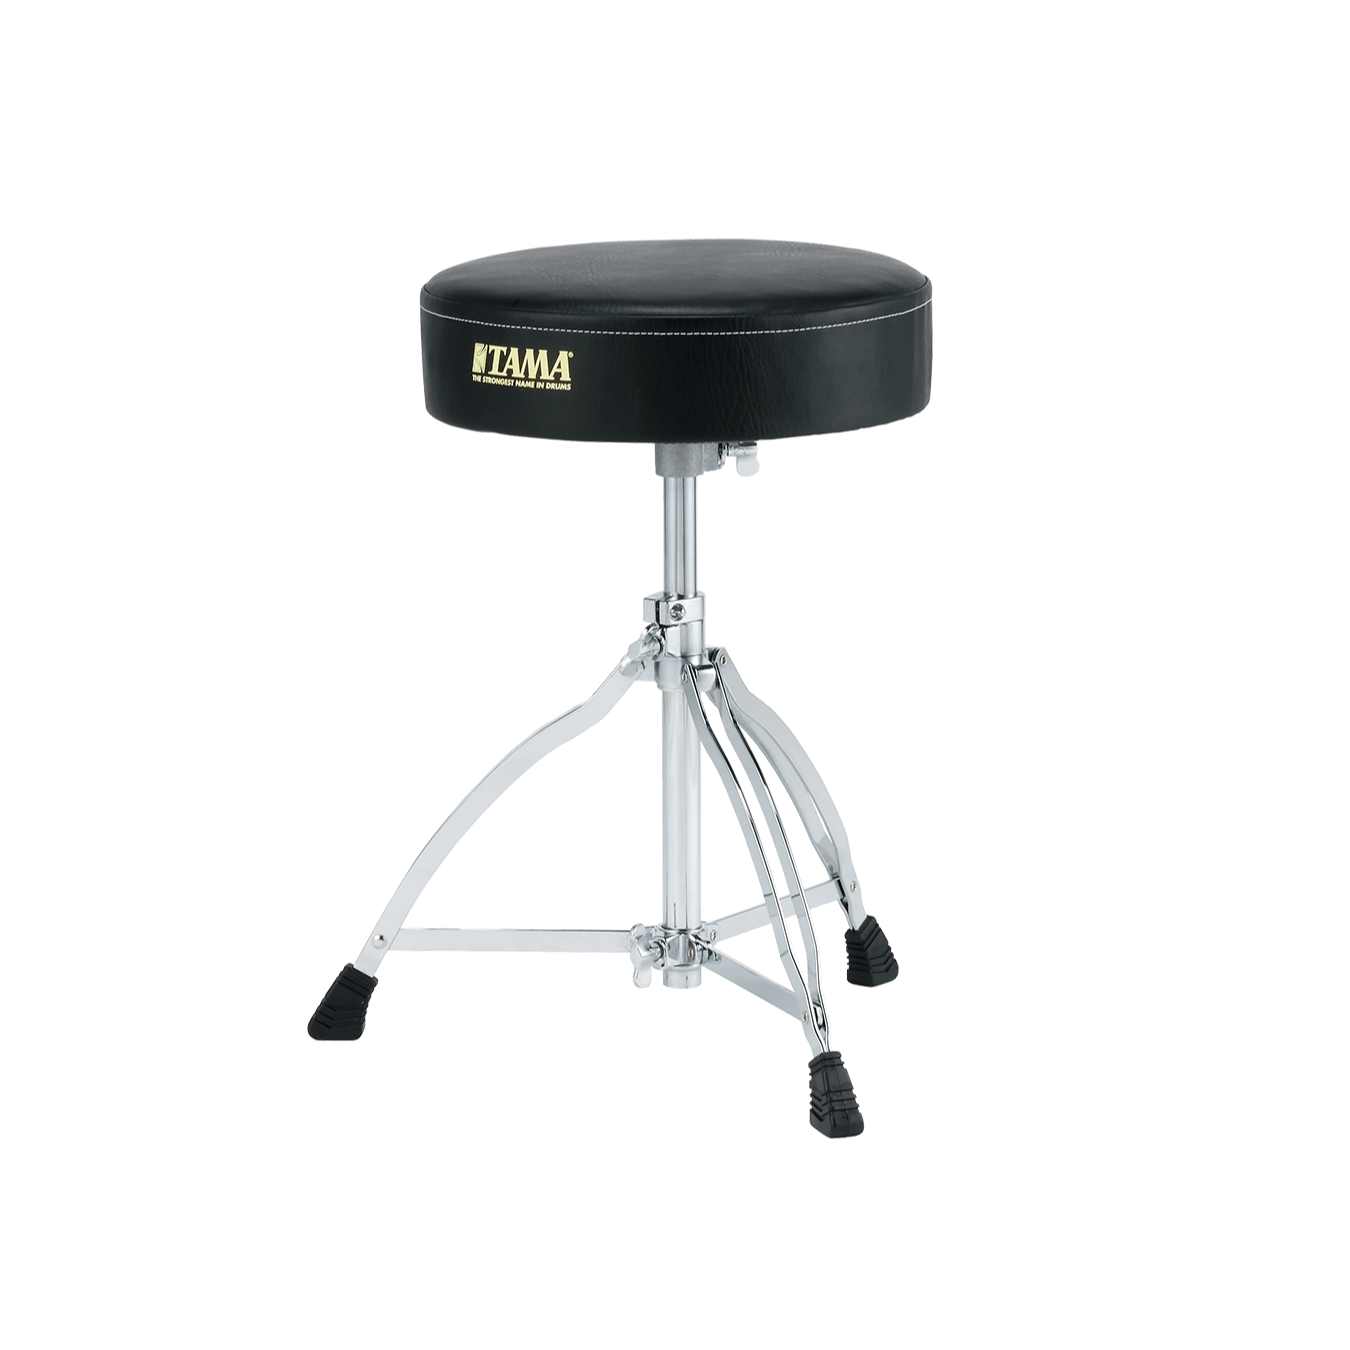 Tama NEW Tama HT130 Standard Drum Throne